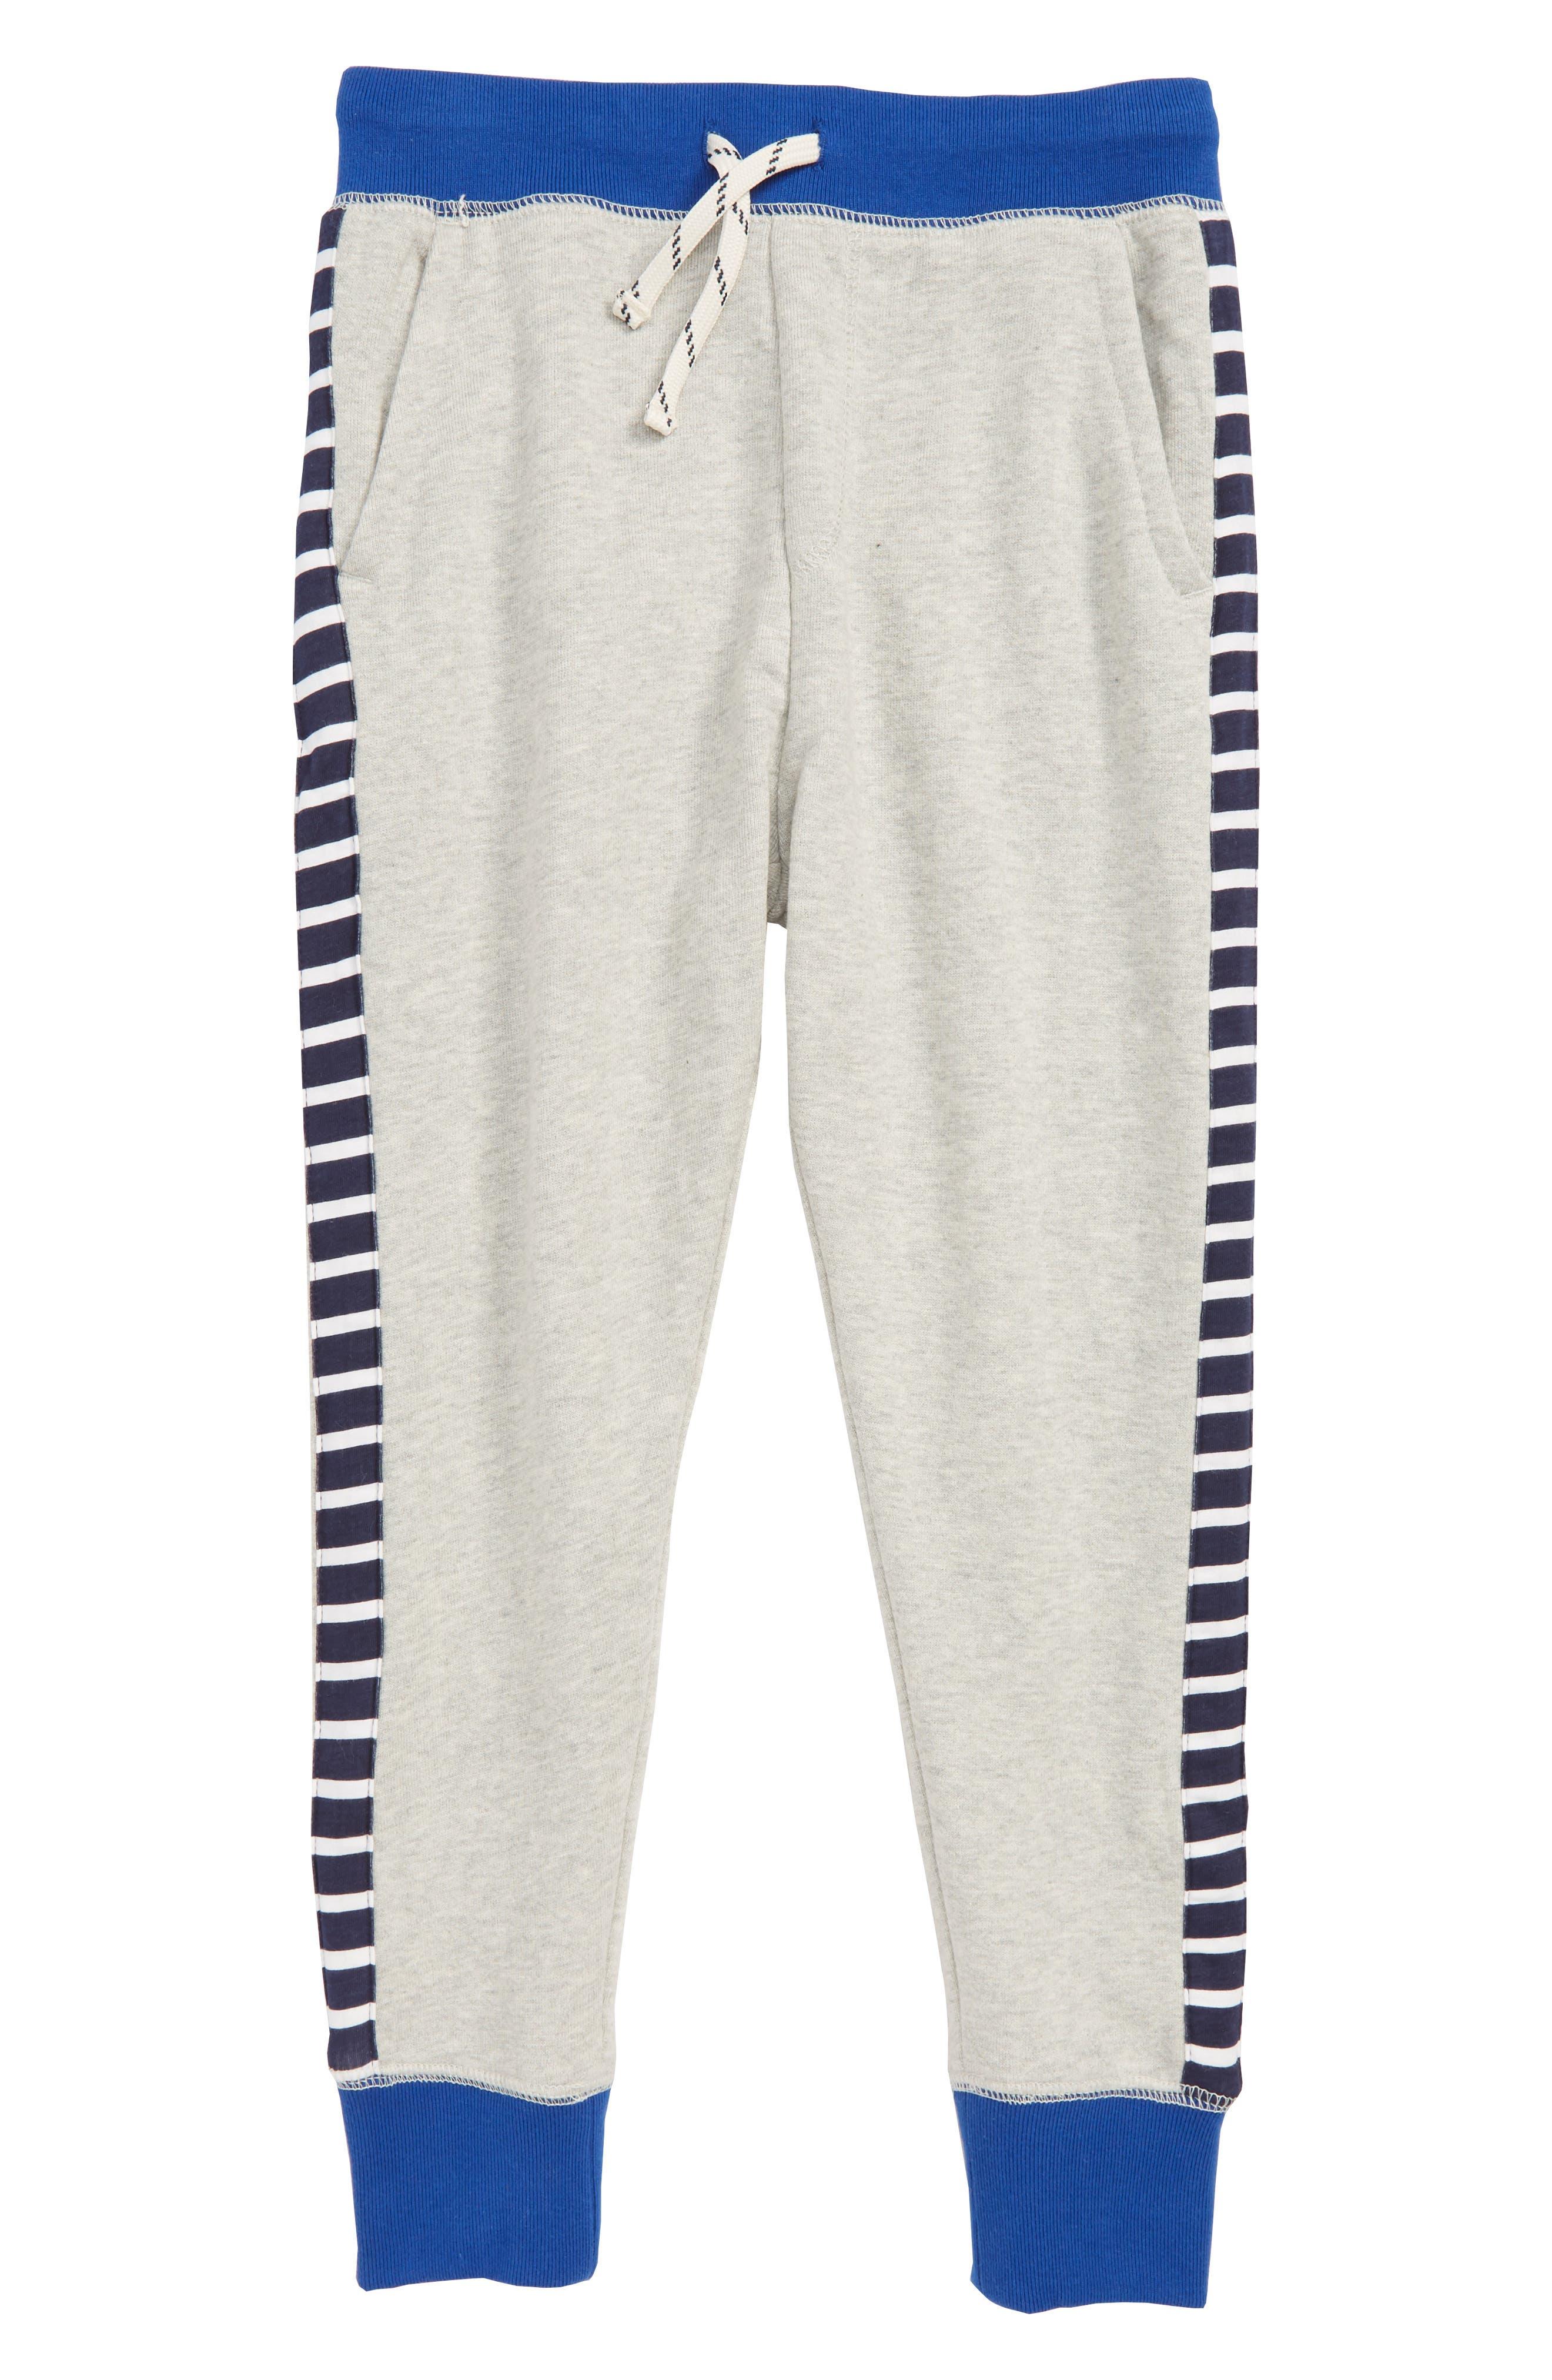 Side Stripe Sweatpants,                             Main thumbnail 1, color,                             BRIGHT CERISE REGAL